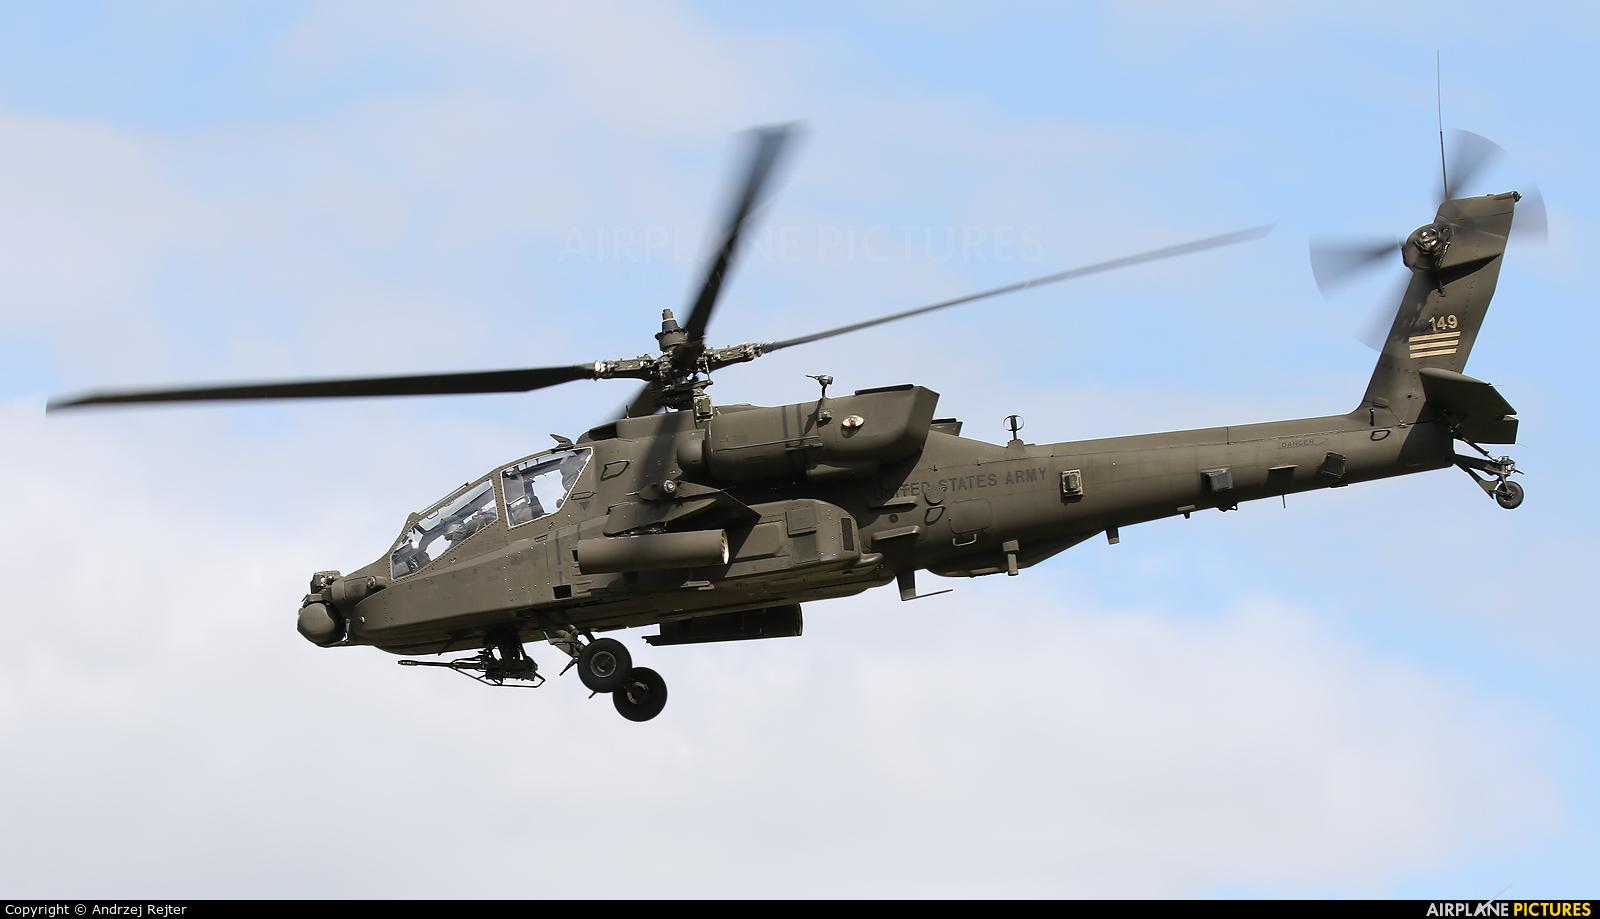 USA - Army 17-03149 aircraft at Kętrzyn - Wilamowo